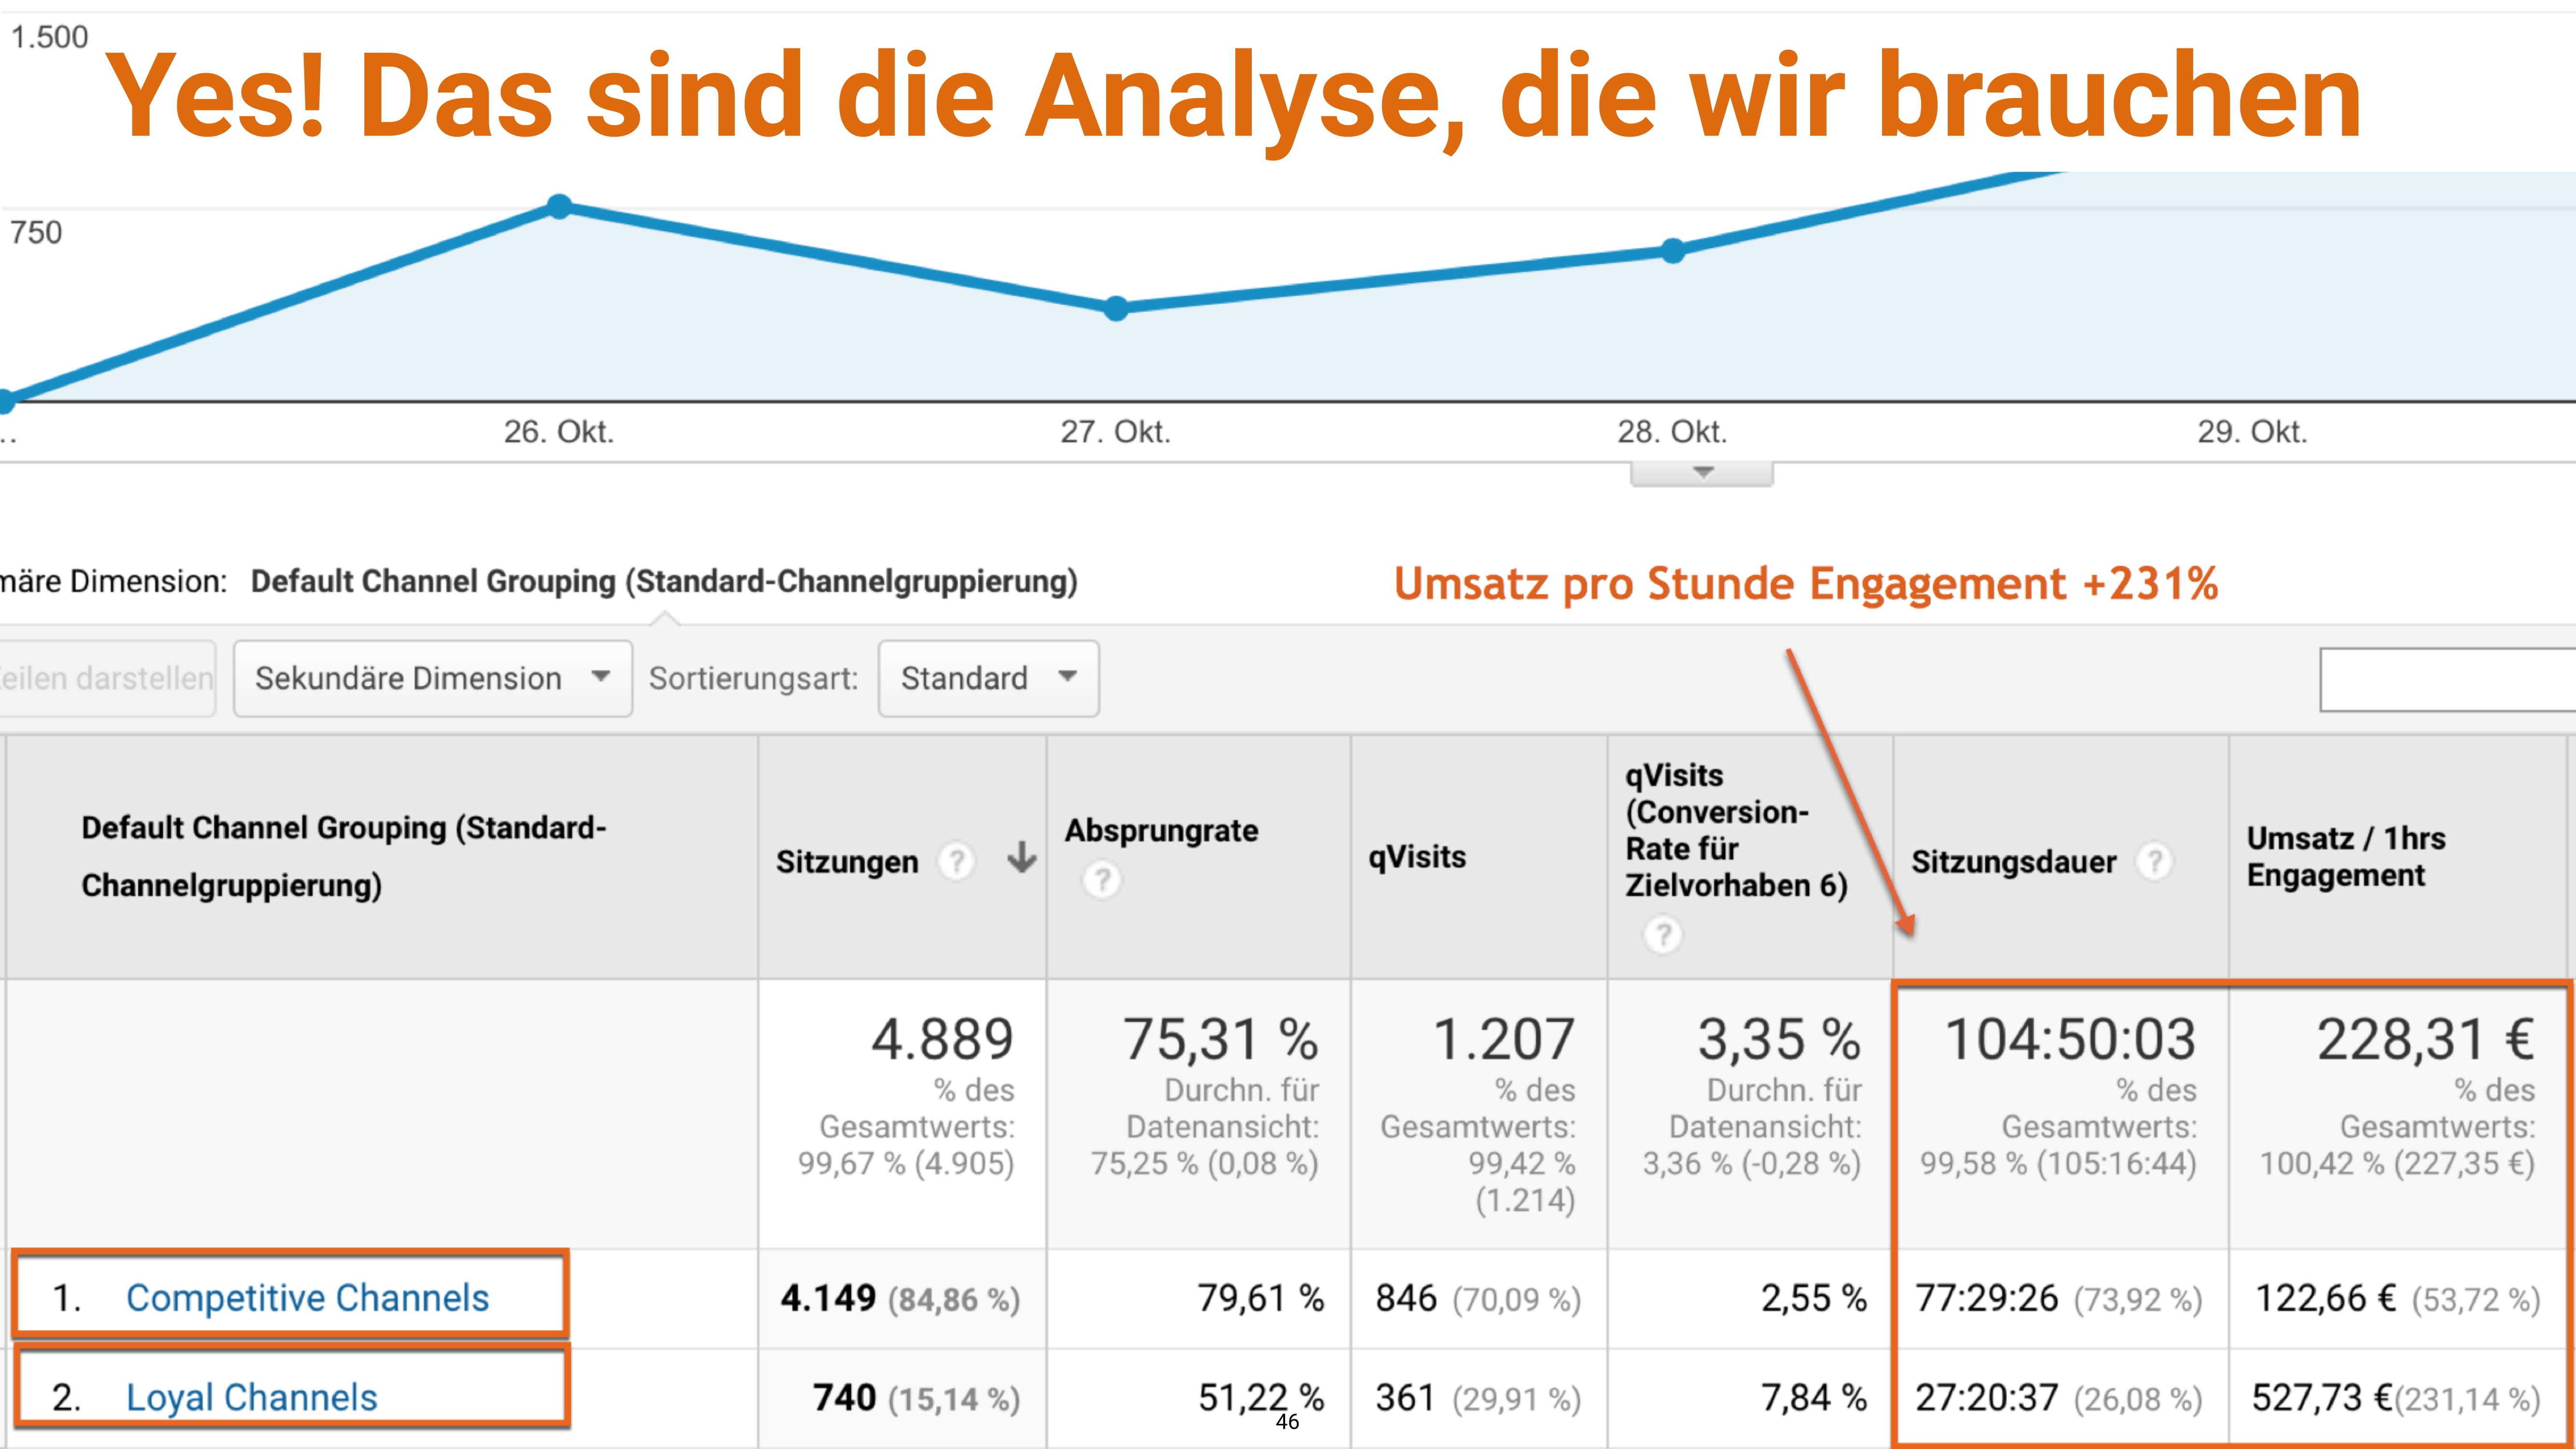 google-analytics-fortgeschrittene-segmentierungsstrategien-seo-day-short-version2-46.jpg